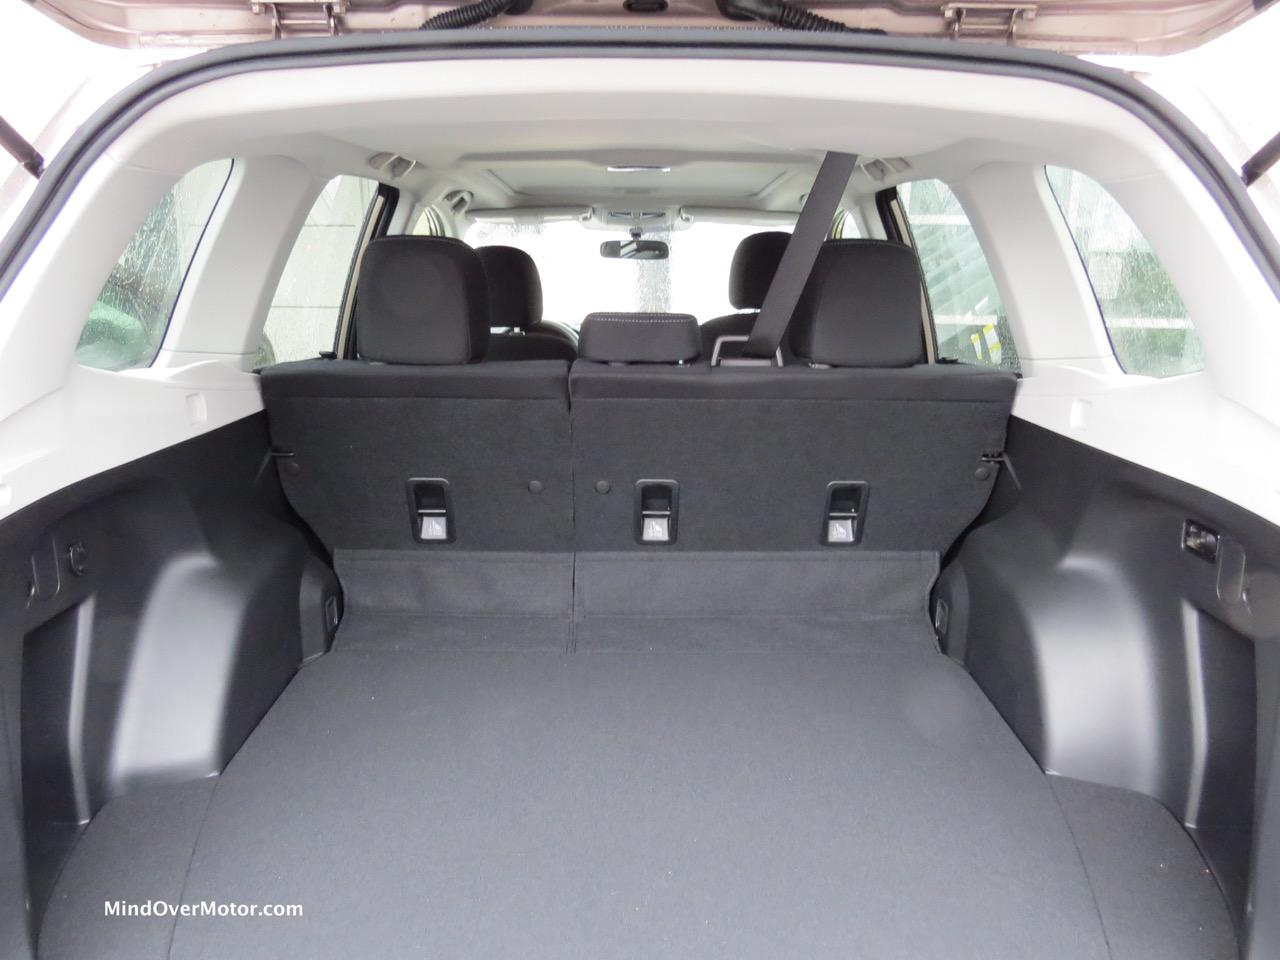 2015 Subaru Forester Cargo Hold